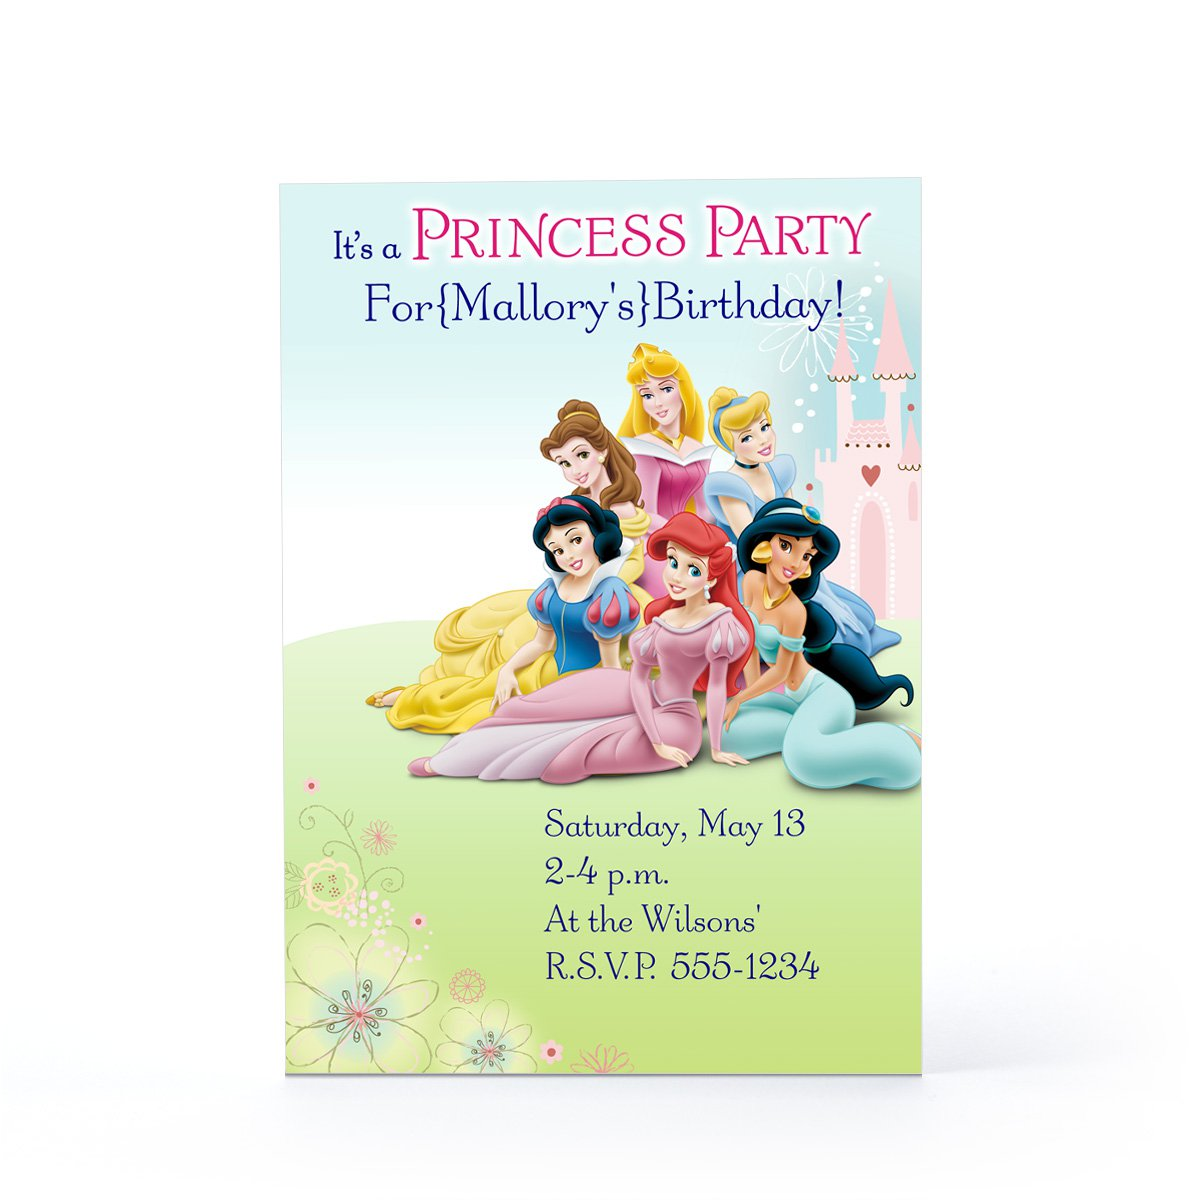 Hallmark Cards Printable Birthday Invitation